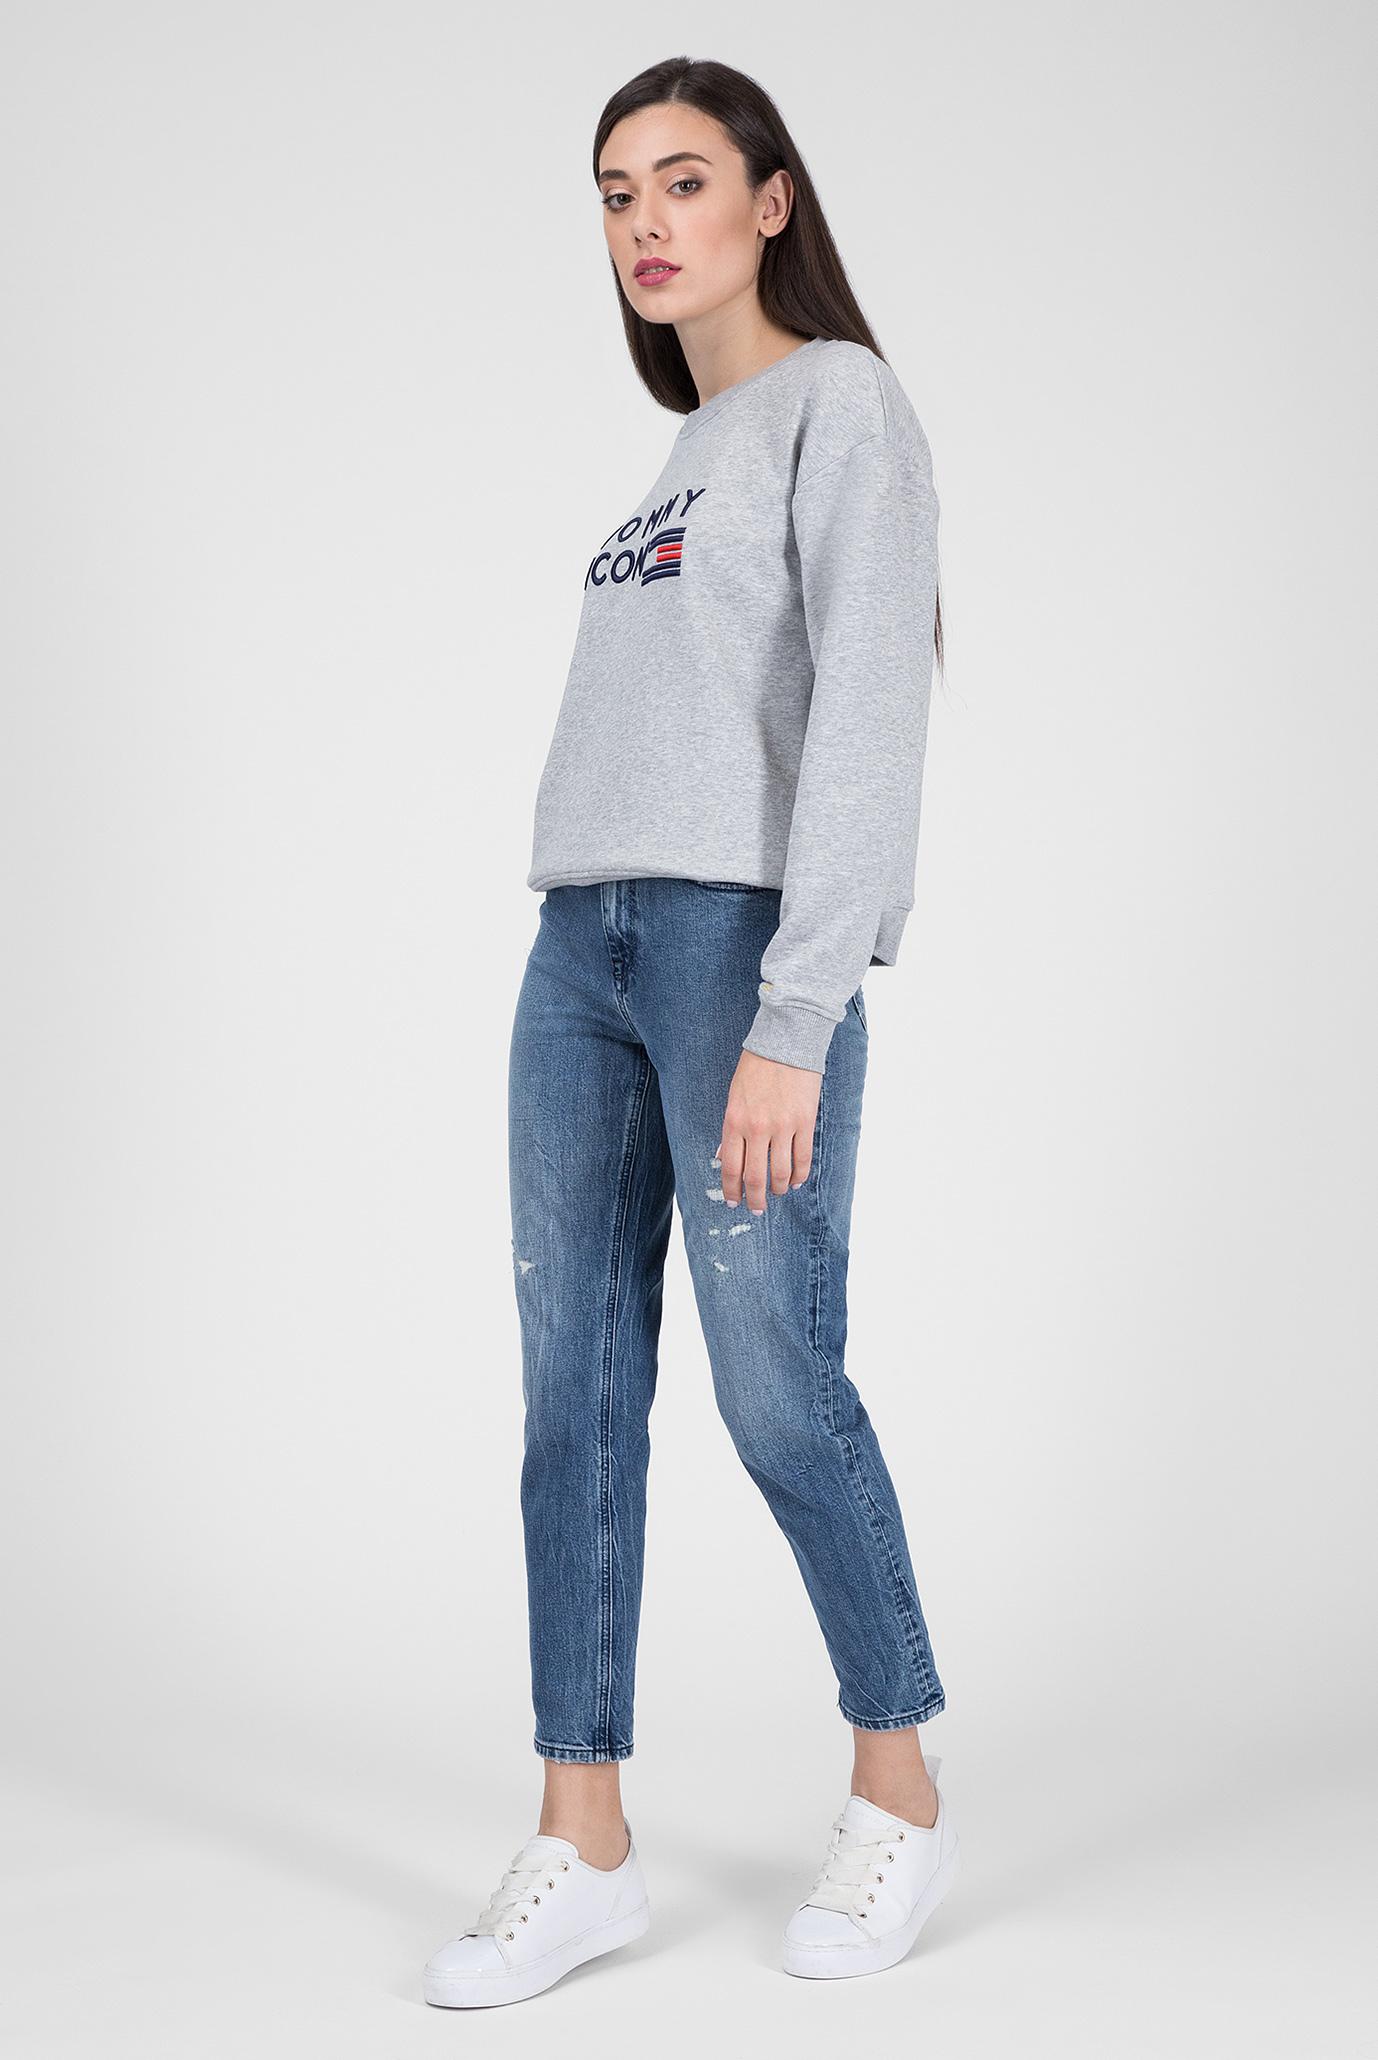 Купить Женские голубые джинсы ICON GRAMERCY HW ANKLE MORGANE Tommy Hilfiger Tommy Hilfiger WW0WW23722 – Киев, Украина. Цены в интернет магазине MD Fashion